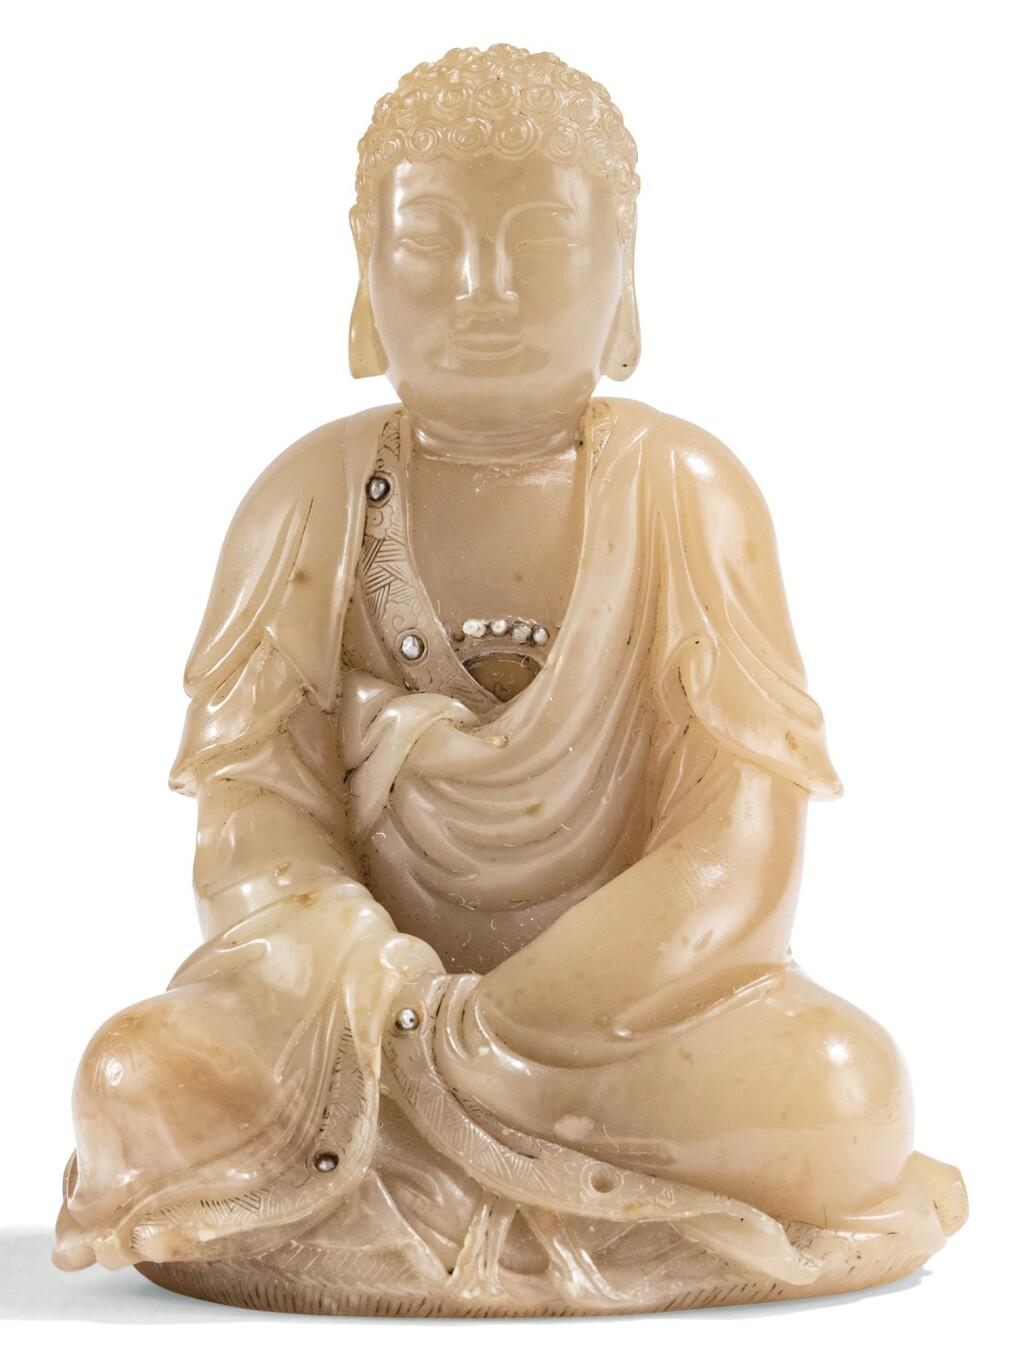 STATUETTE DE BOUDDHA EN STÉATITE DYNASTIE QING, FIN XVIIE - DÉBUT XVIIIE SIÈCLE | 清十七世紀末至十八世紀初 芙蓉石雕佛坐像  「周彬」款 | A soapstone carving of Buddha, incised Zhou Bing, Qing Dynasty, late 17th/early 18th century